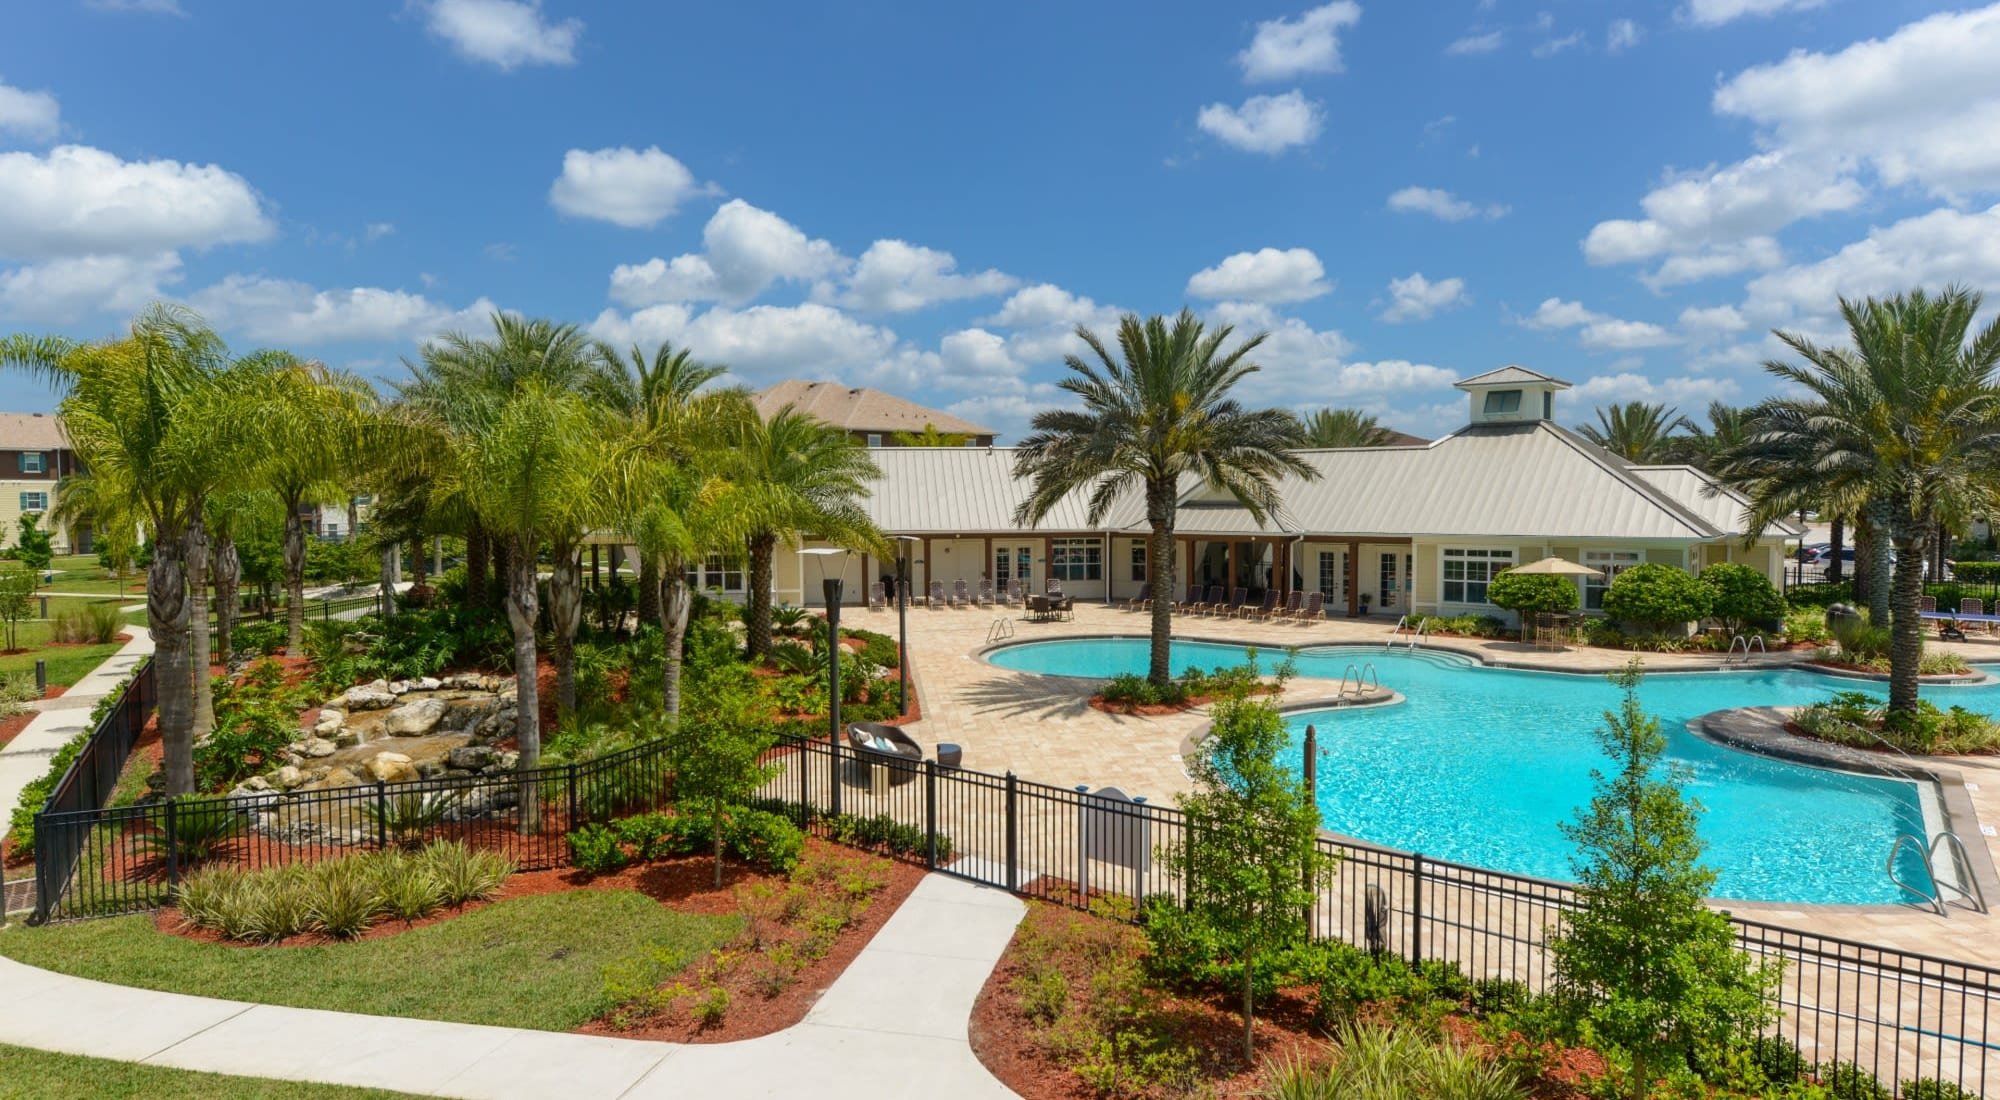 Cabana Club and Galleria Club Apartments in Jacksonville, Florida